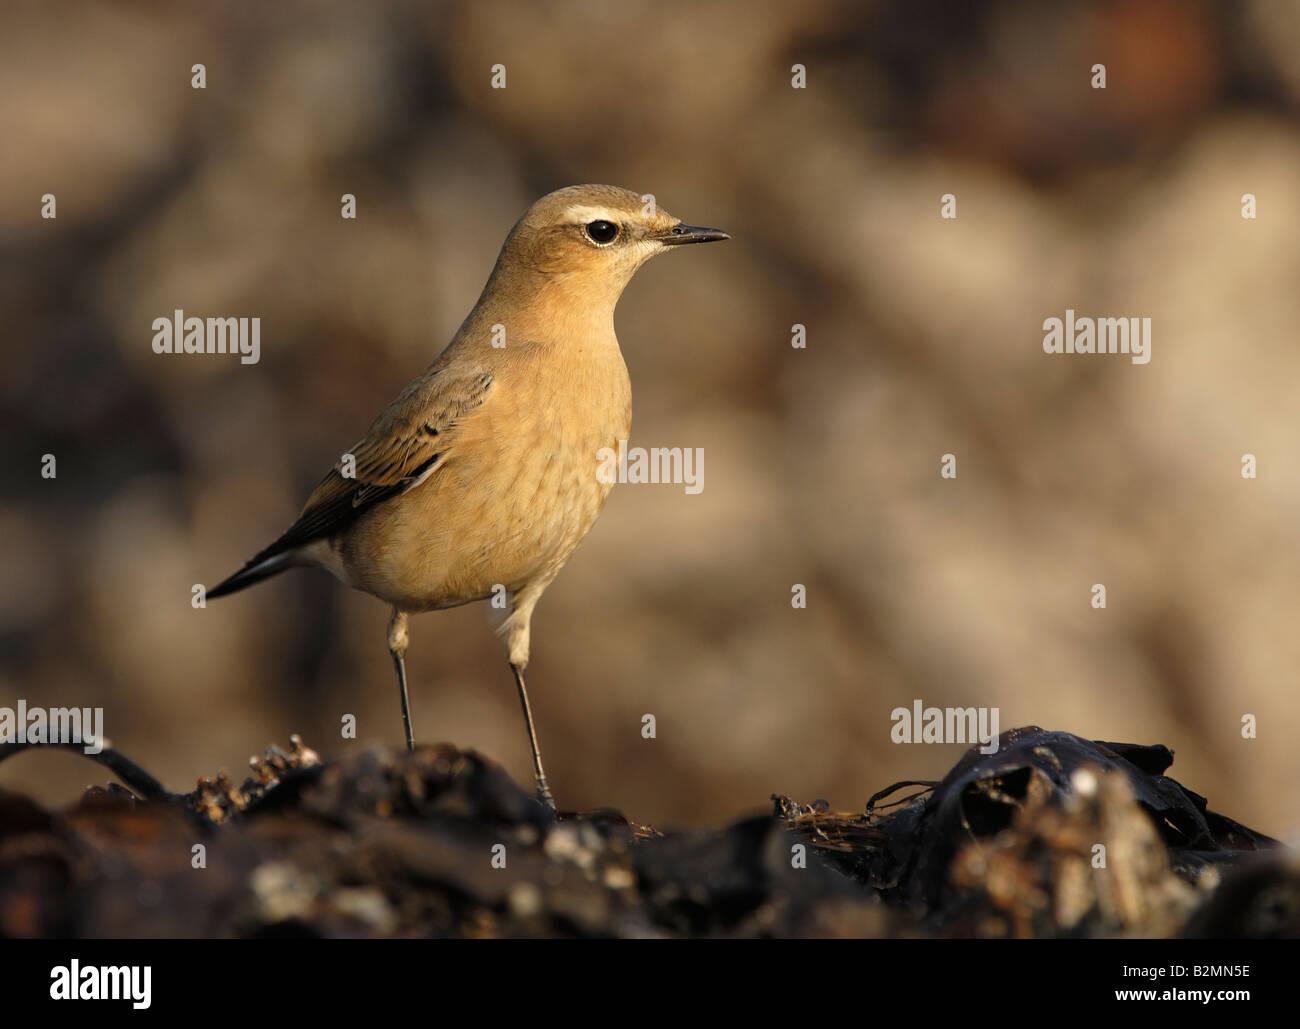 Northern Wheatear Oenanthe oenanthe passerine bird - Stock Image